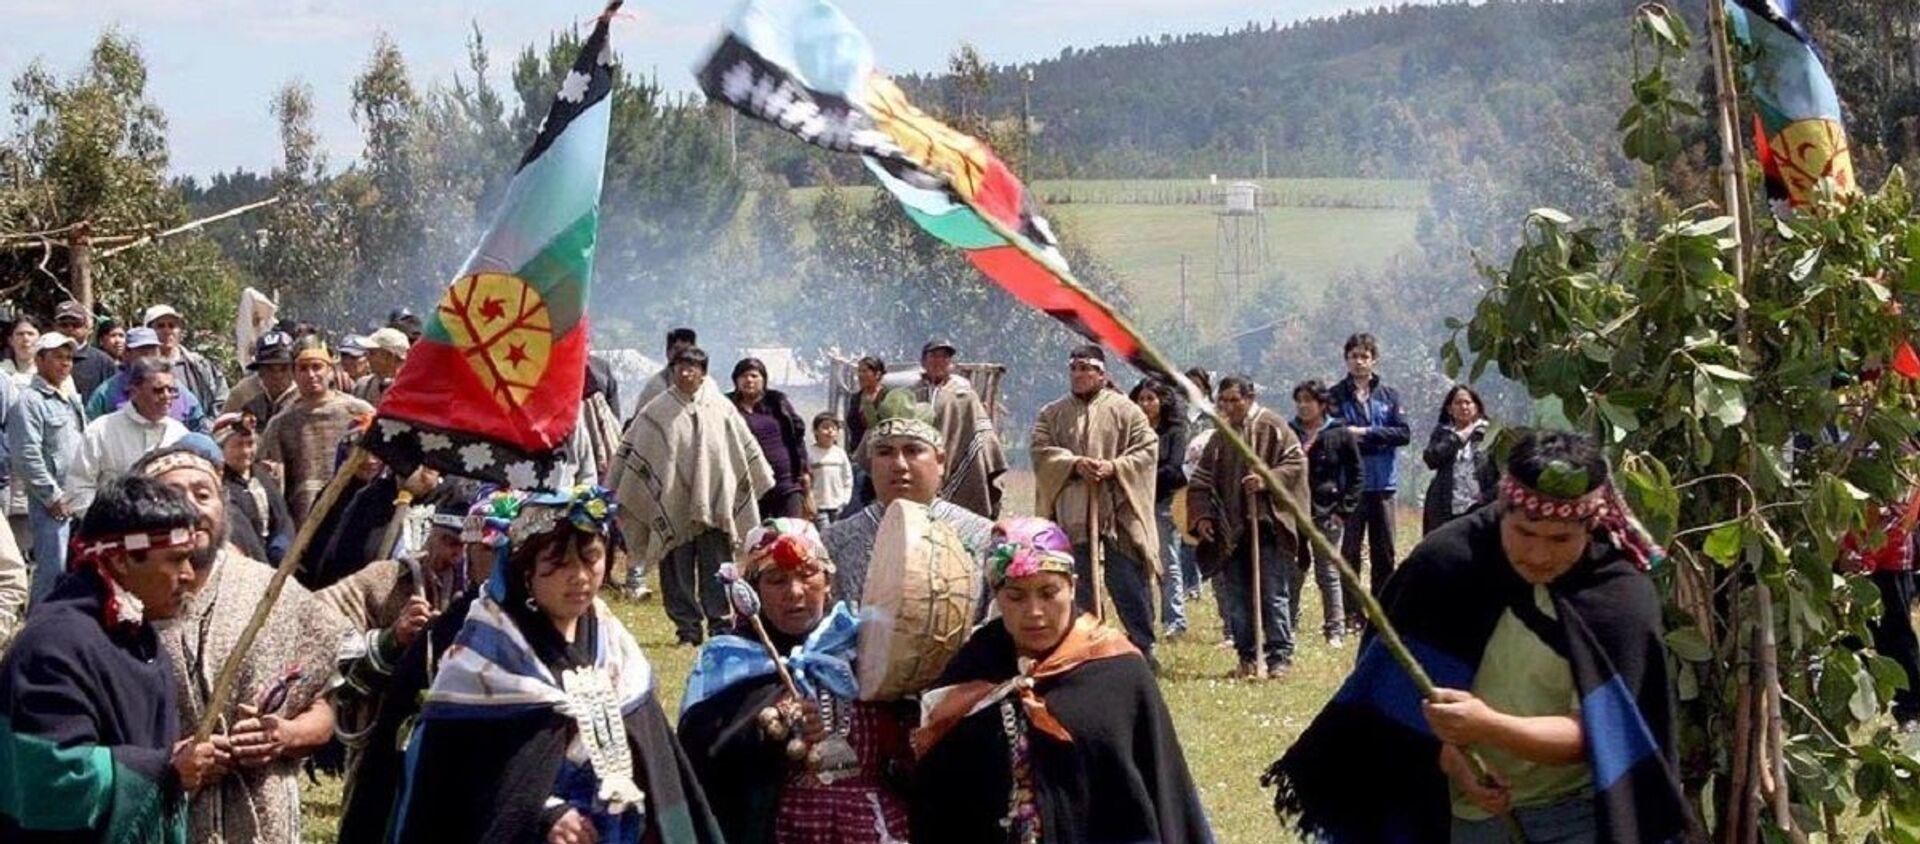 El pueblo mapuche de Chile - Sputnik Mundo, 1920, 31.08.2020